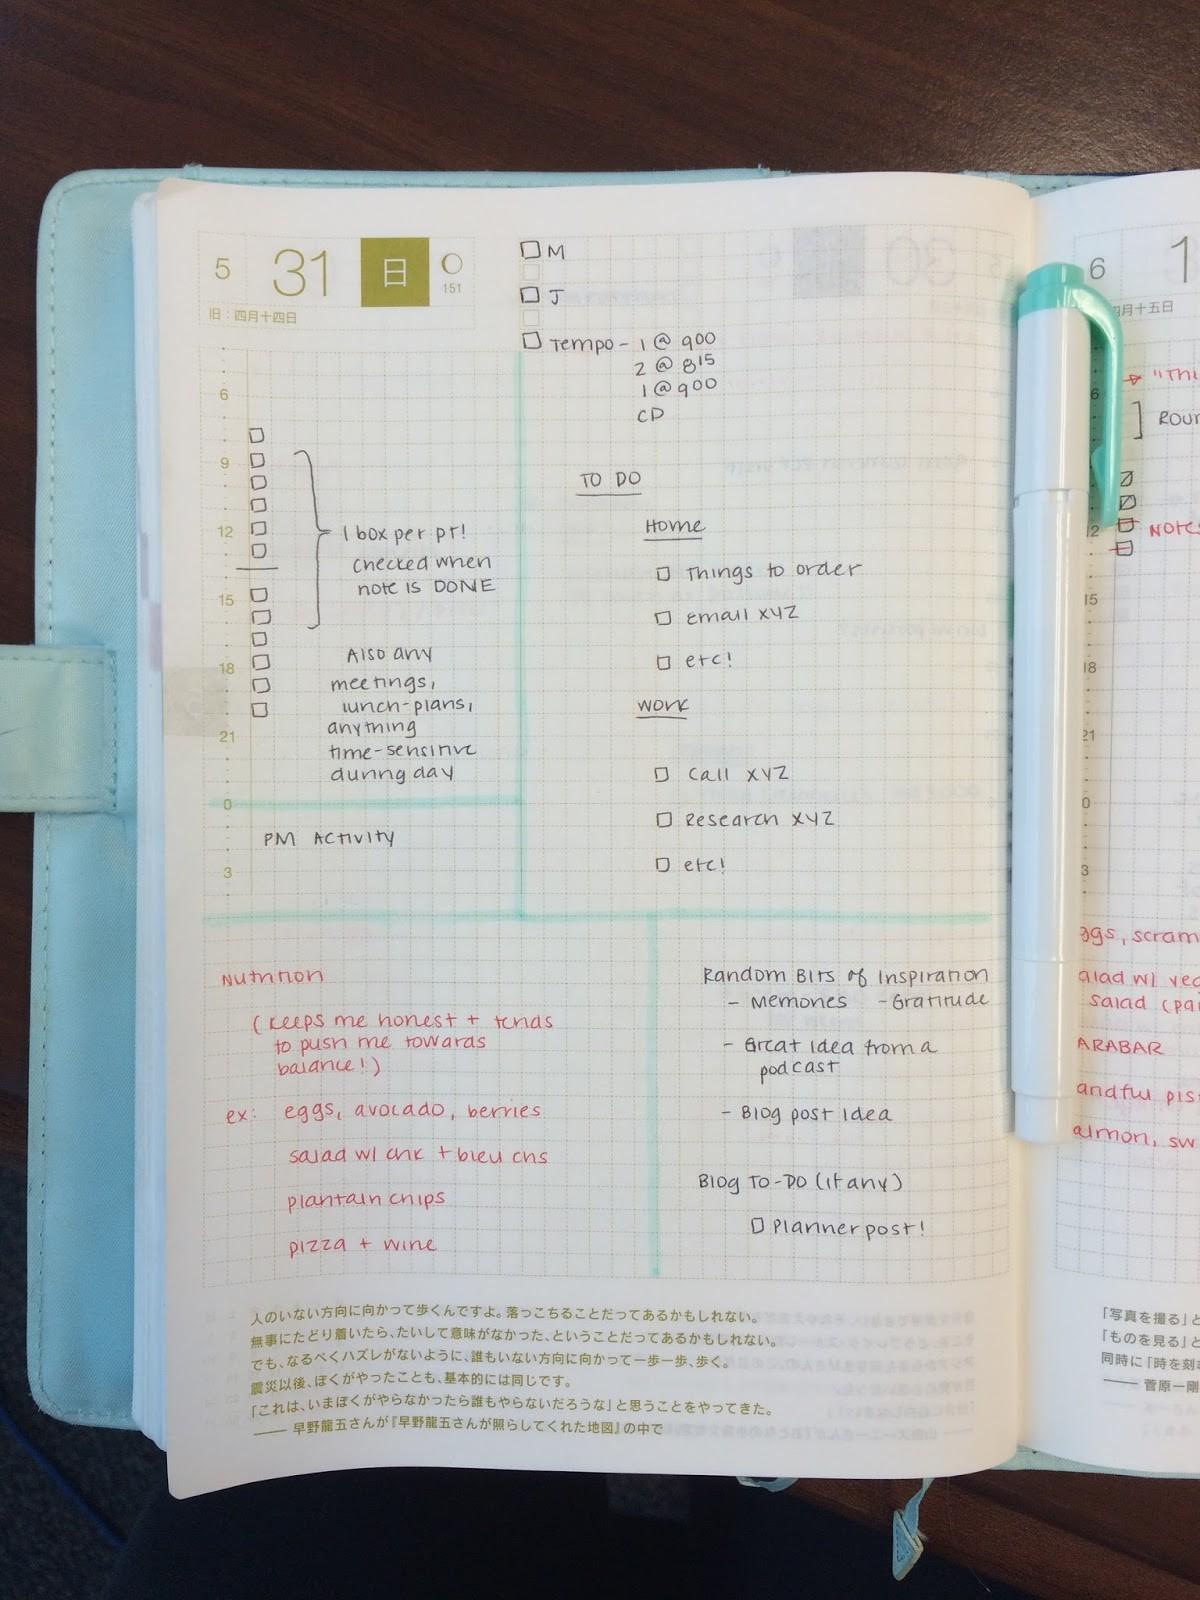 calendar template birthday  Hobonichi Planner: Daily Template - The Shu Box - calendar template birthday